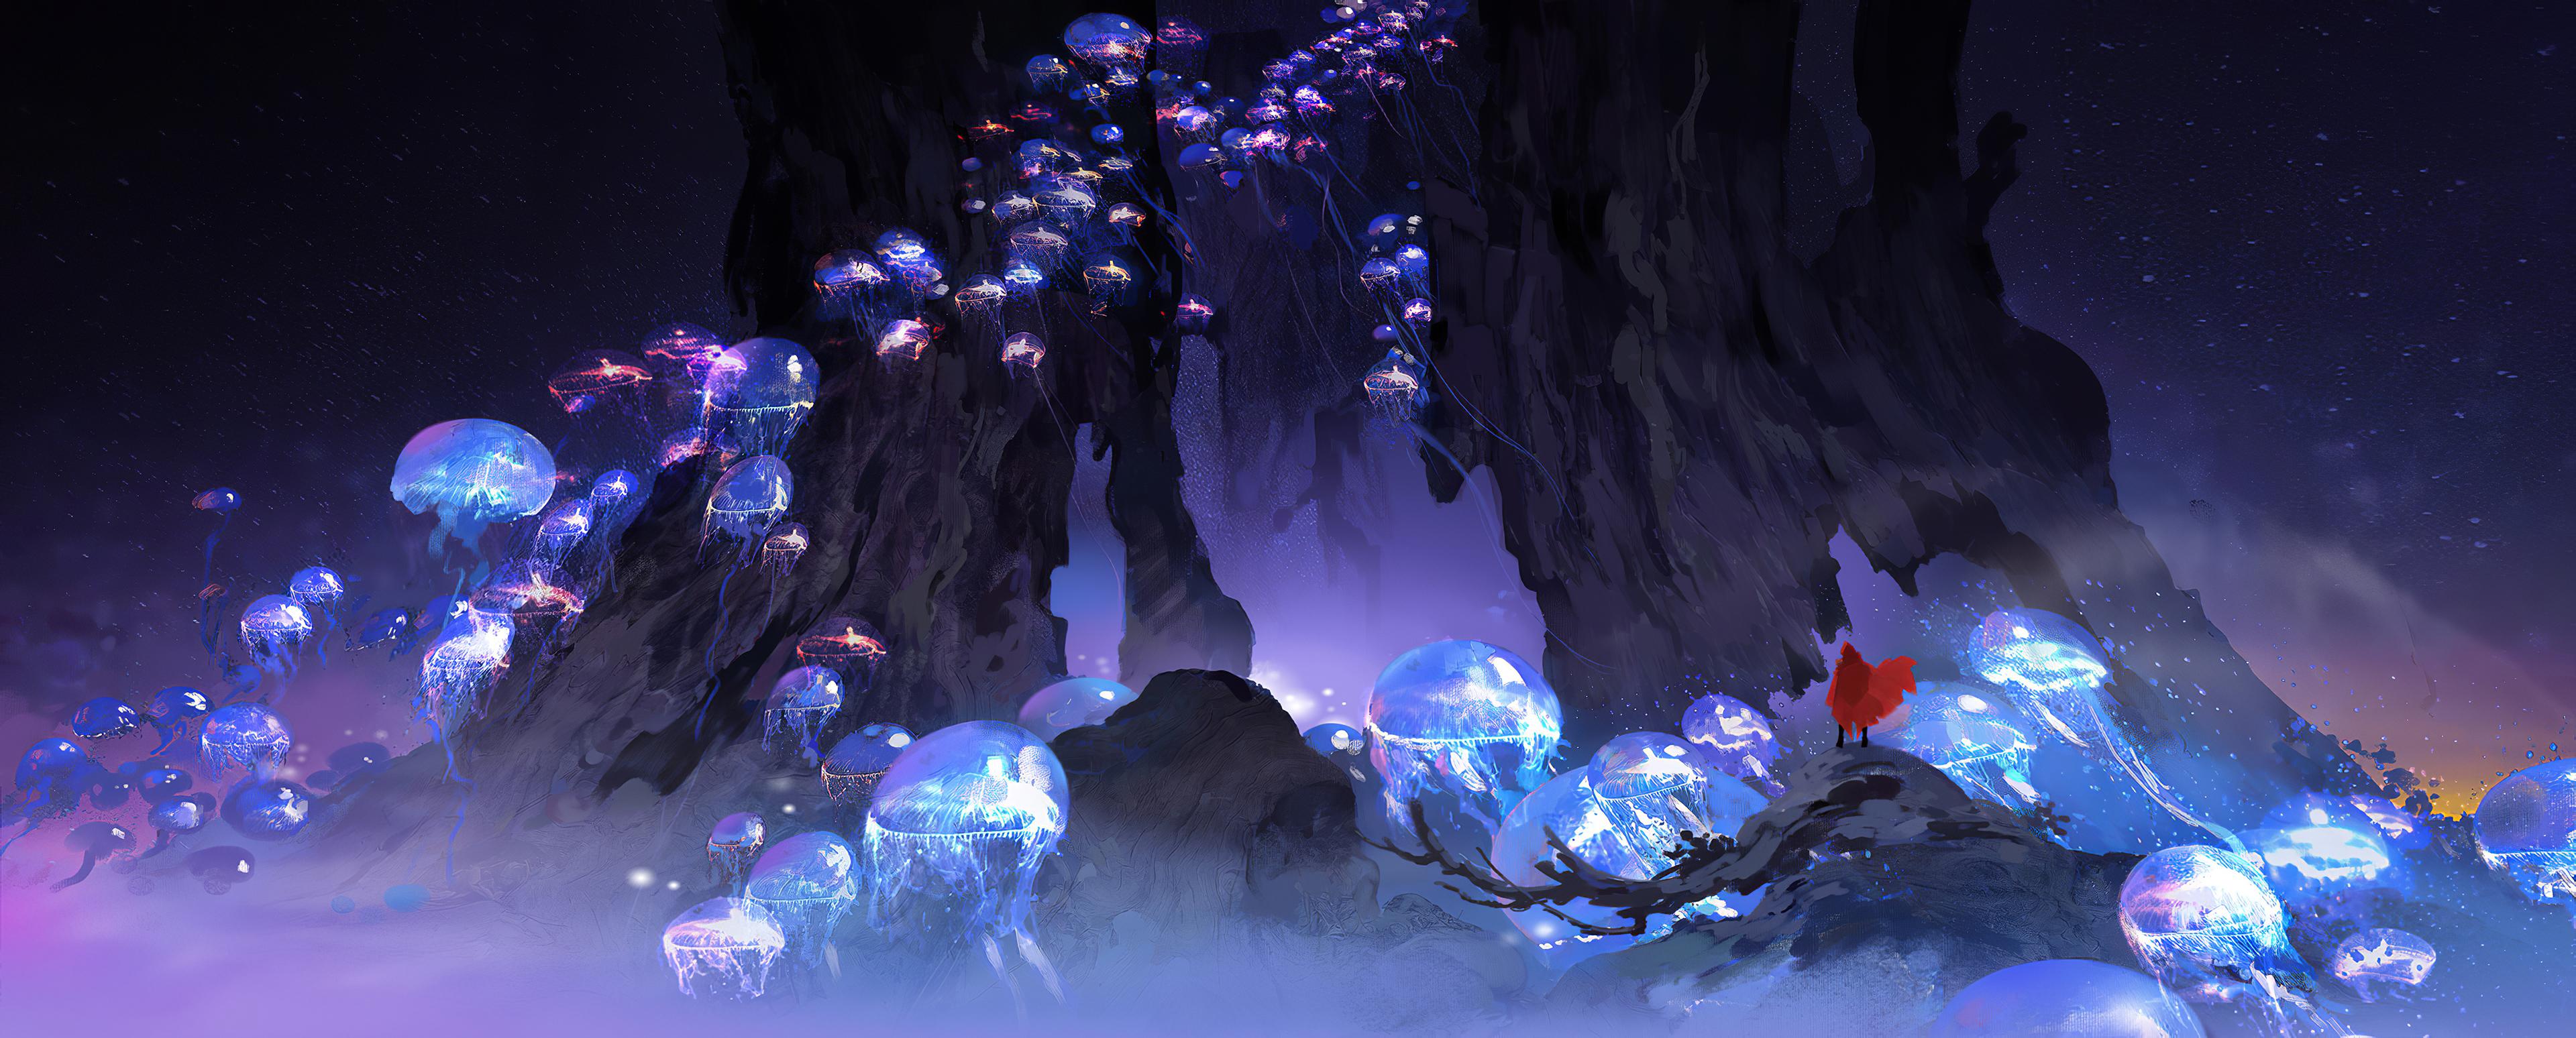 Fondos de pantalla Medusas brillantes Artwork